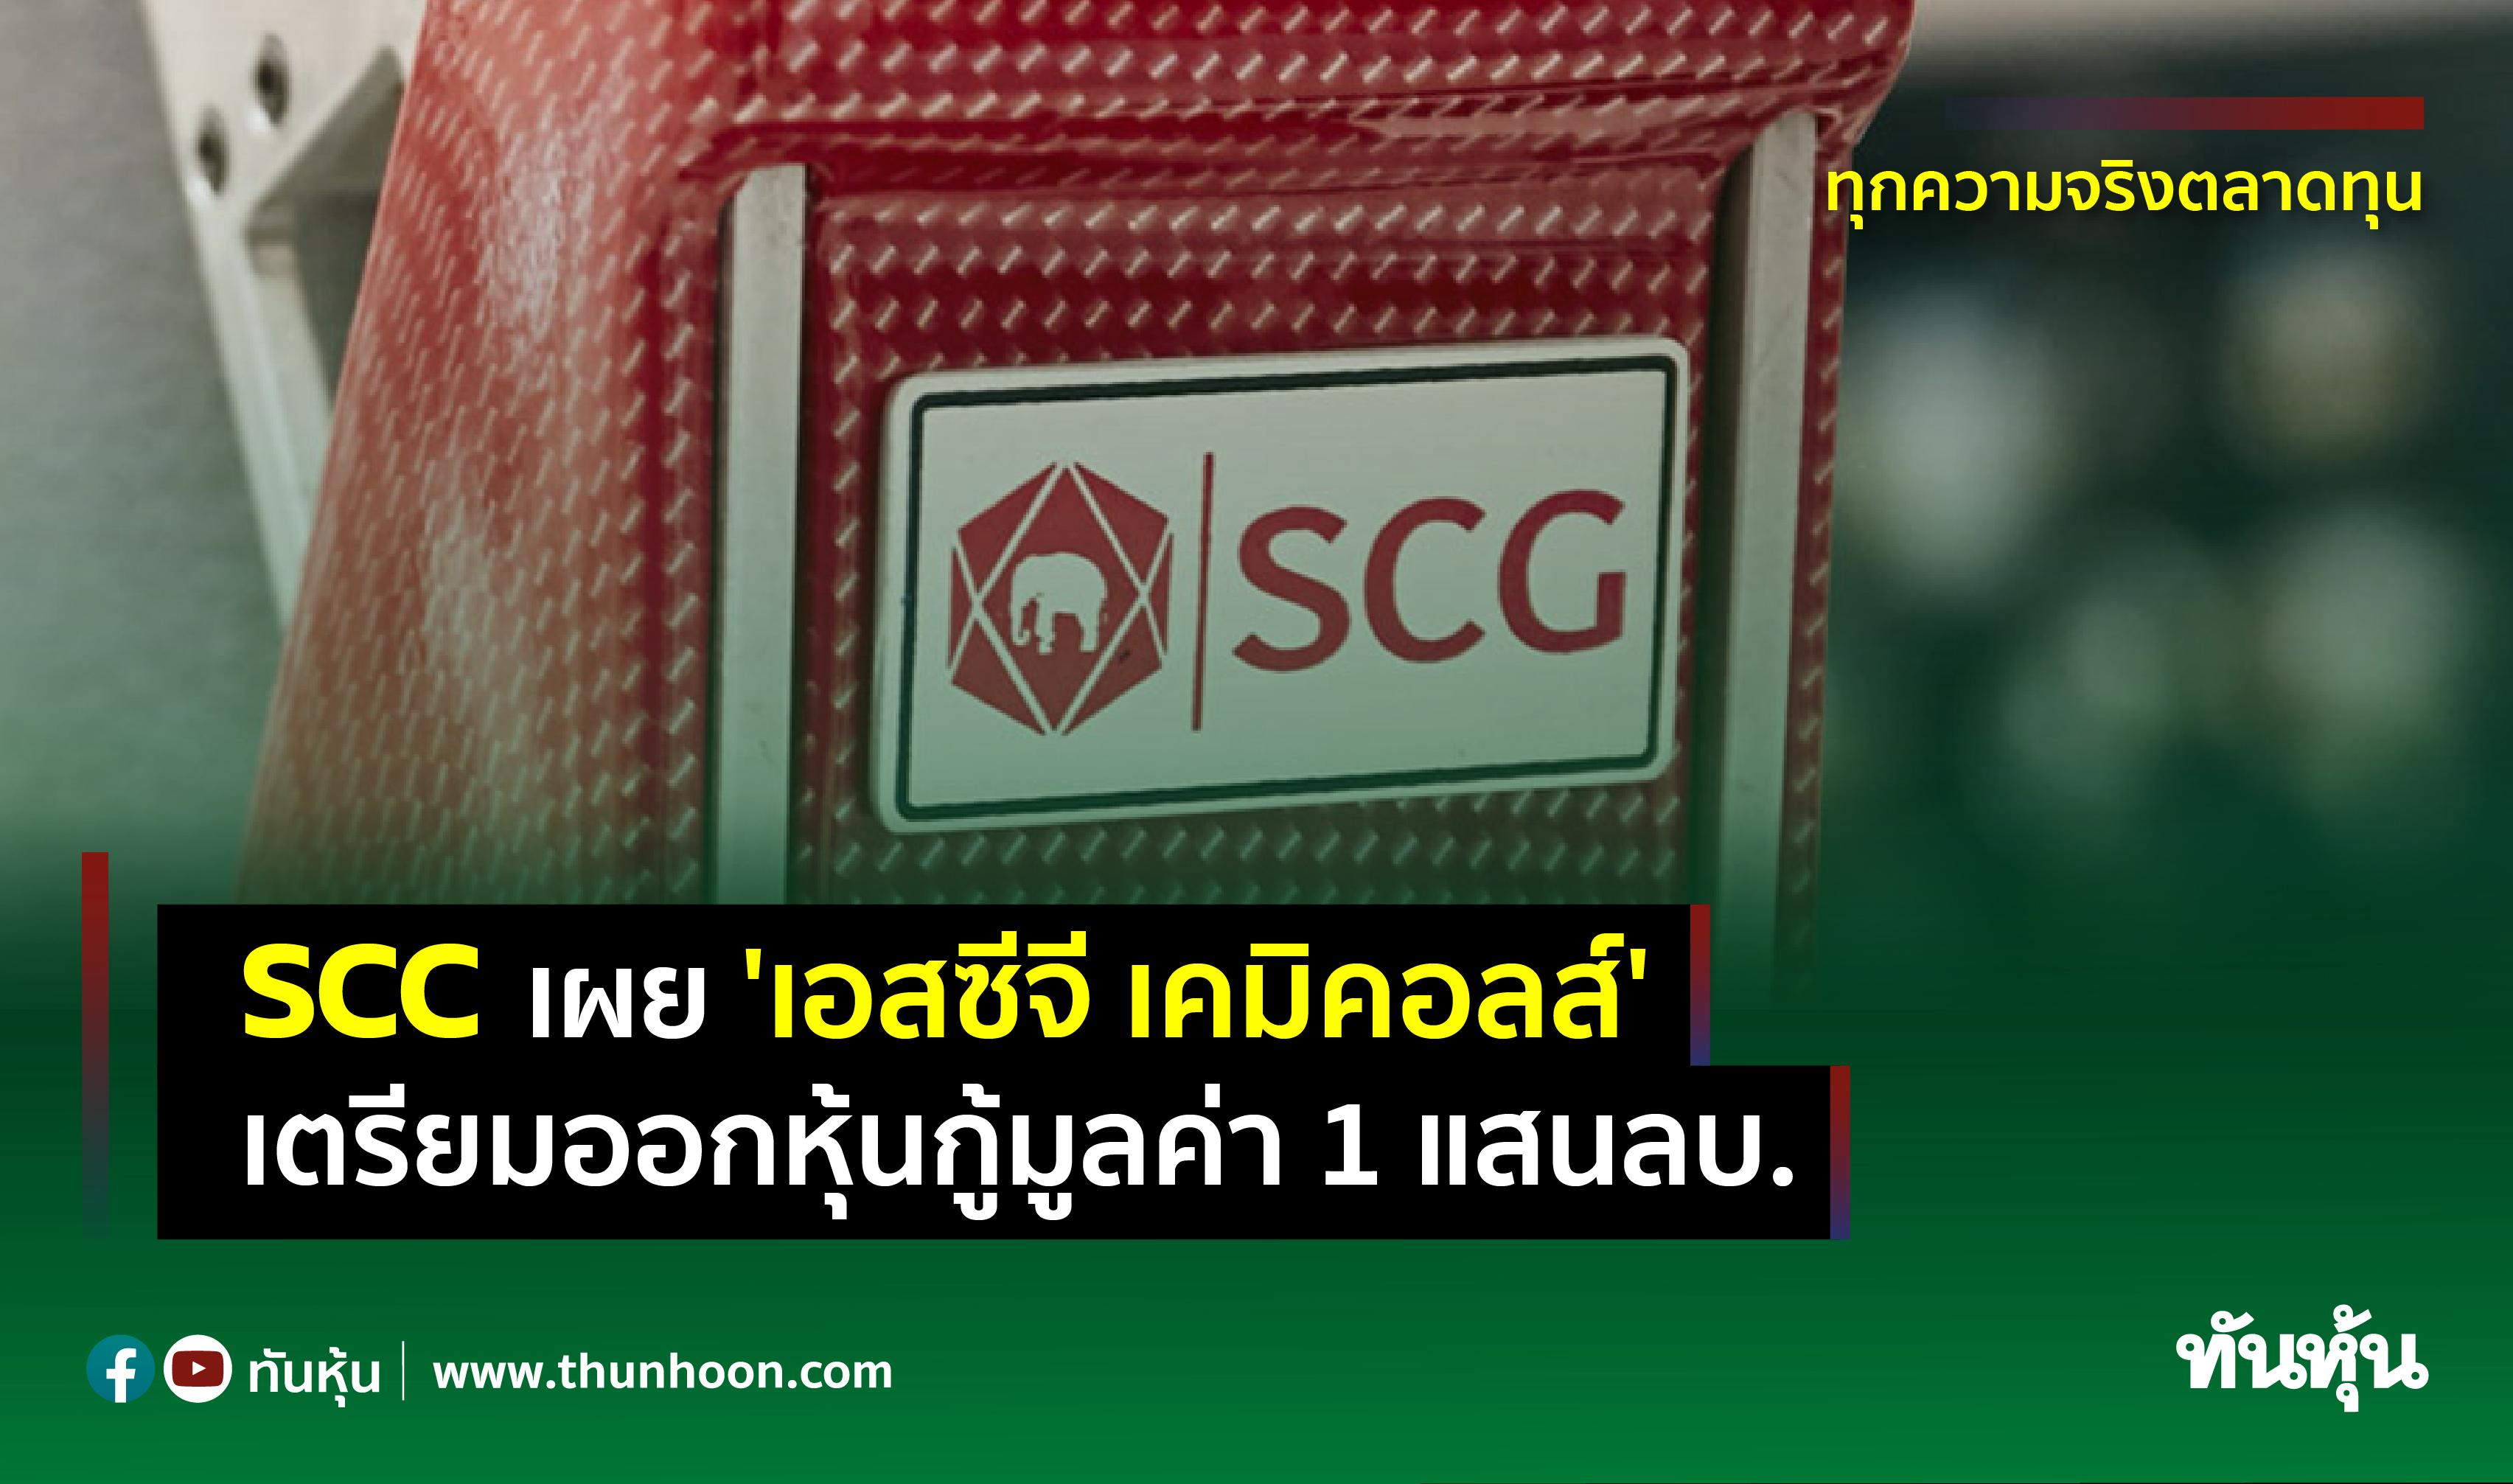 SCC เผย 'เอสซีจี เคมิคอลส์' เตรียมออกหุ้นกู้มูลค่า 1 แสนลบ.